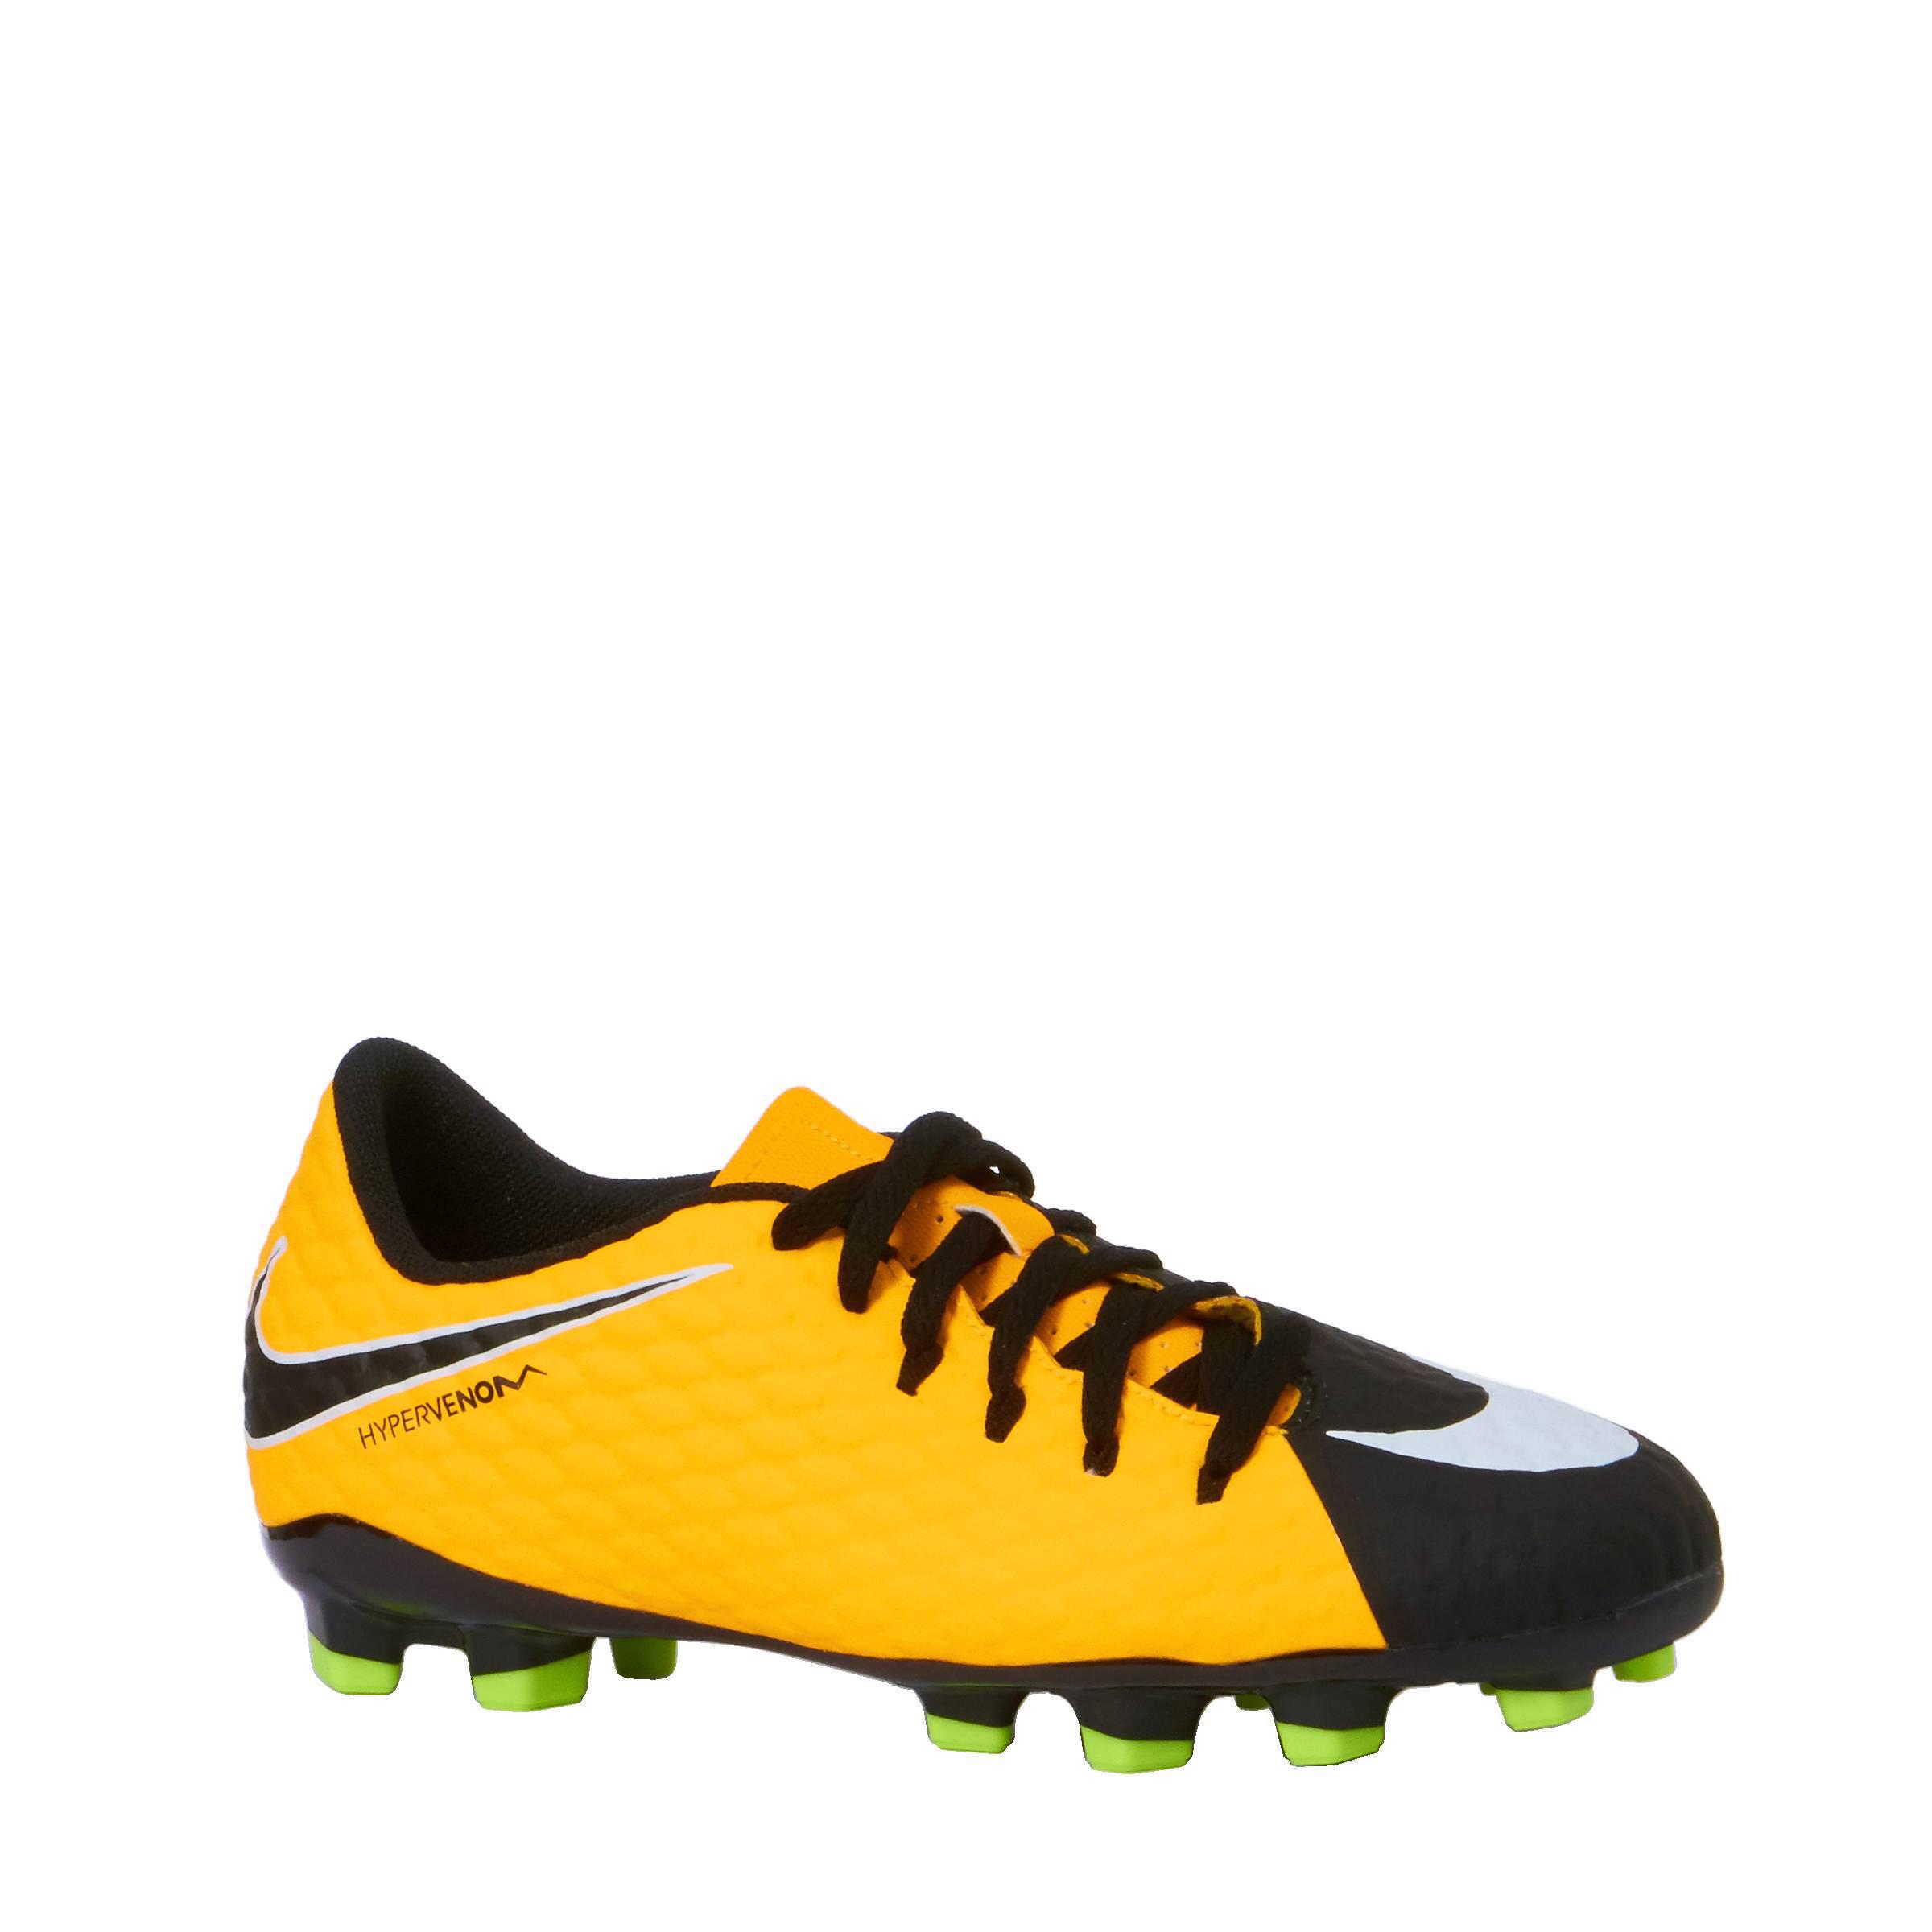 lowest price a5942 b02c6 nike-hypervenom-phelon-iii-fg-kids-voetbalschoenen-zwart-0886668002392.jpg